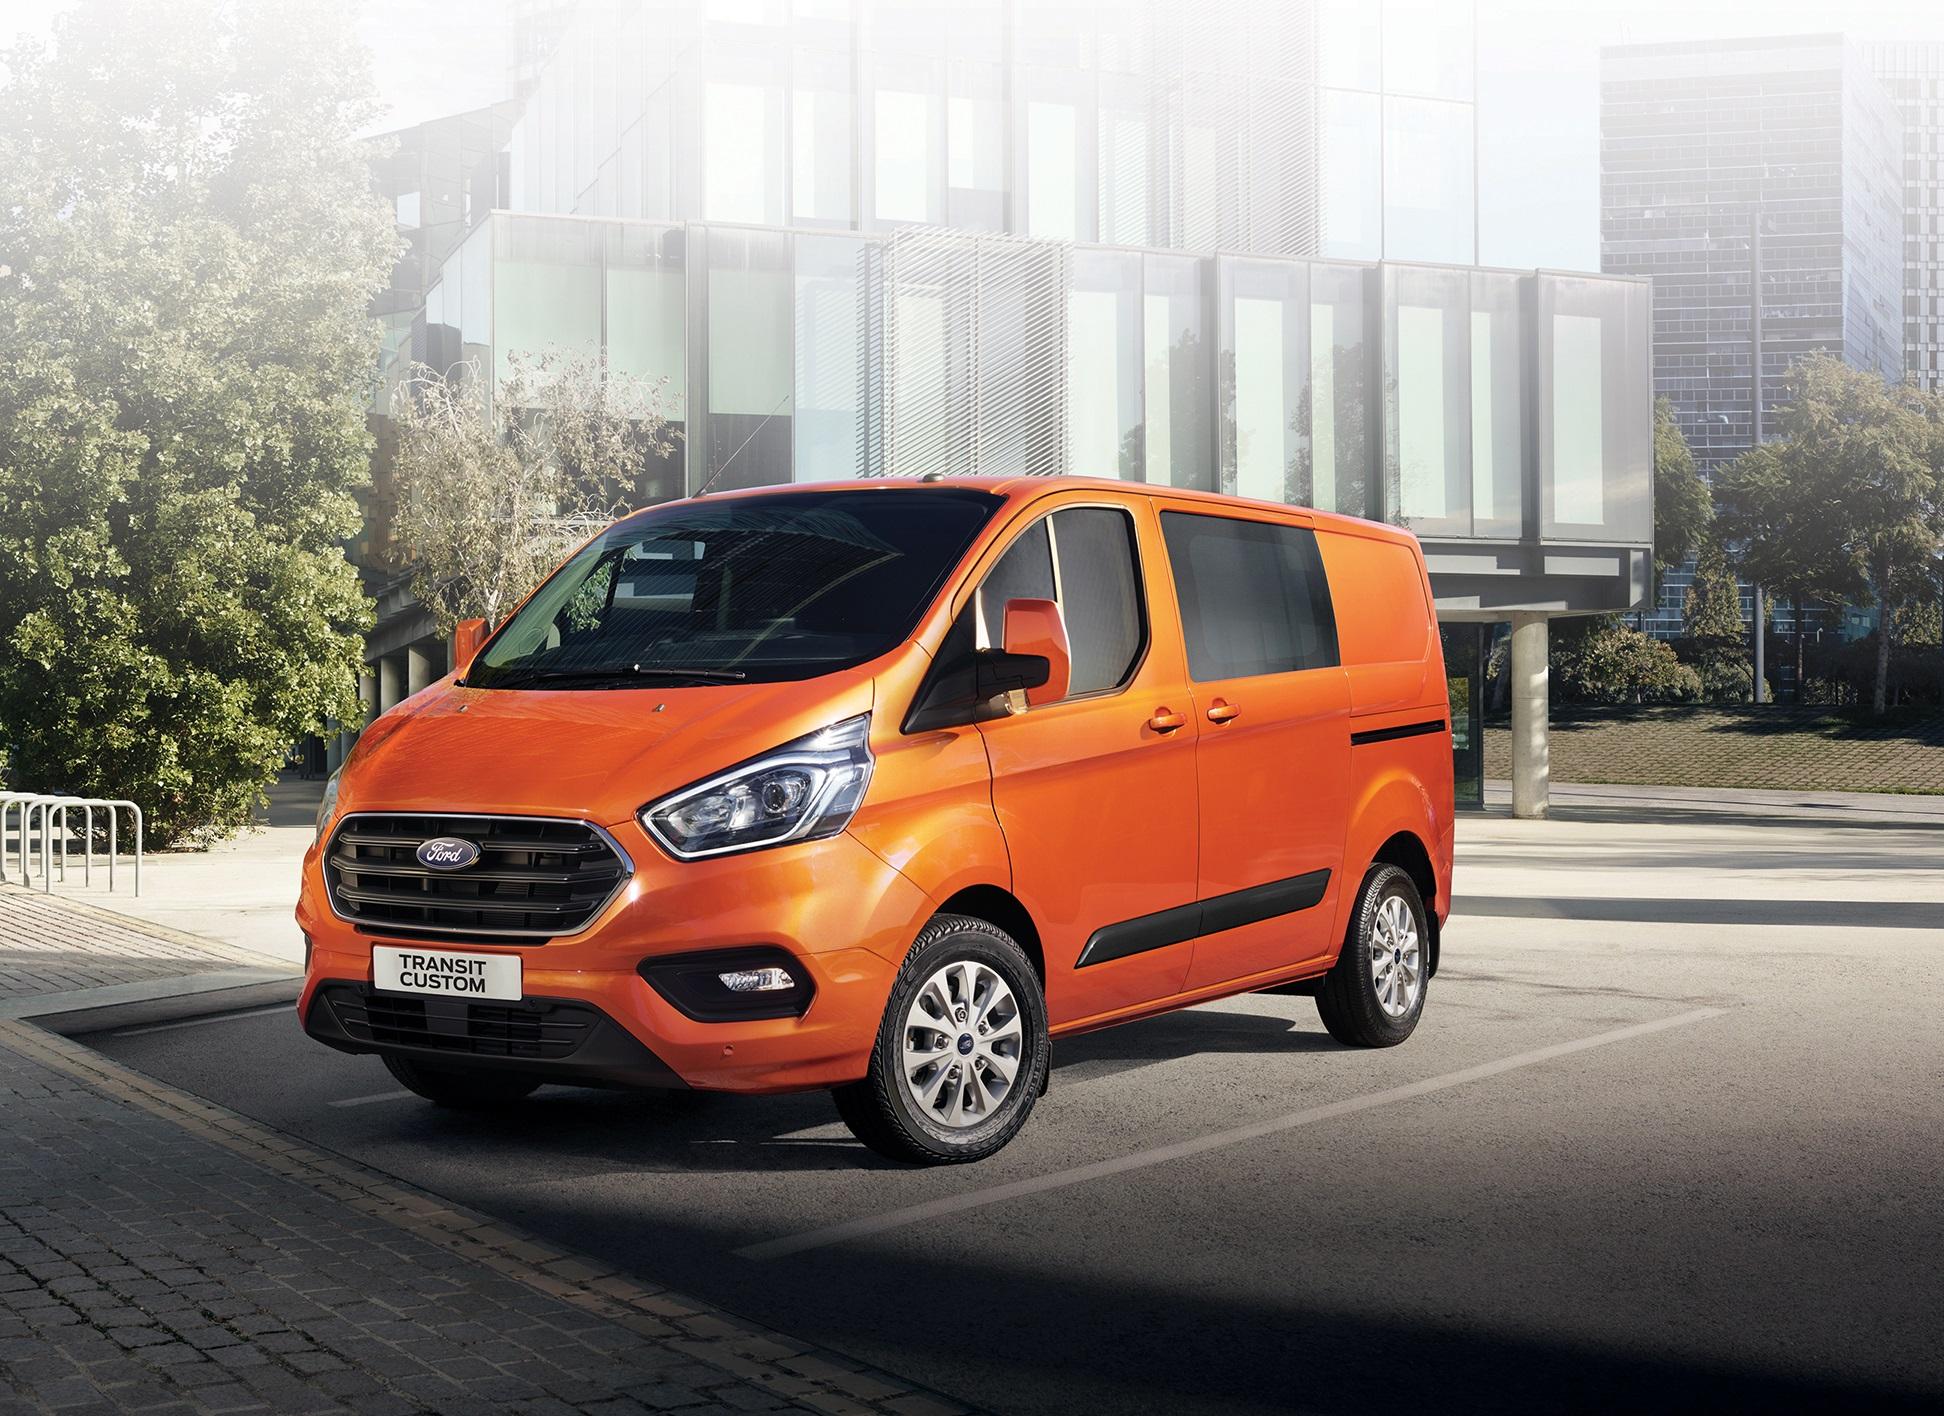 yeni-ford-transit-custom.jpg